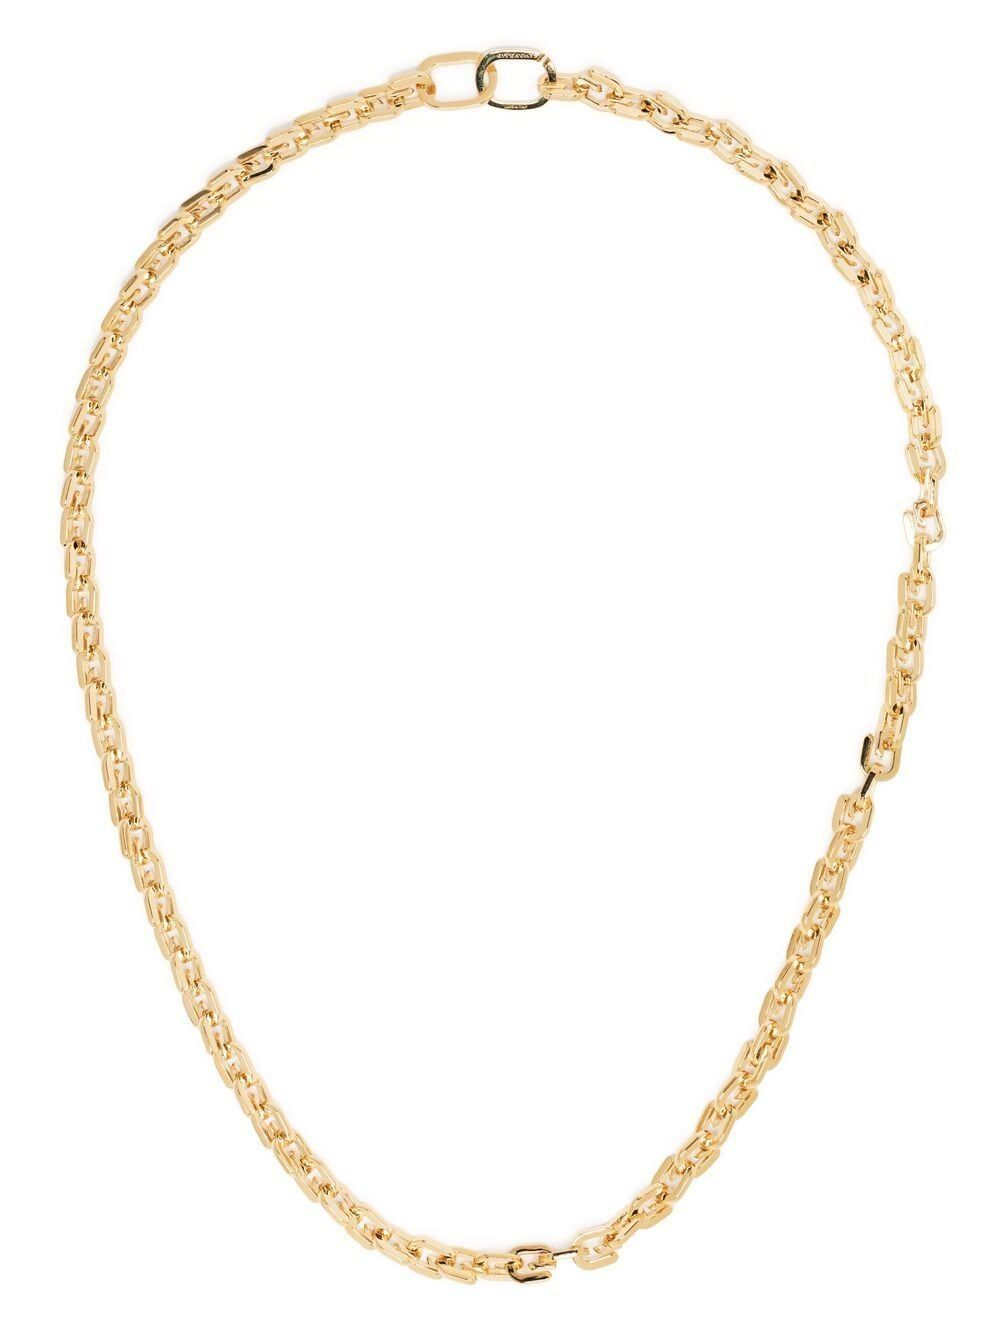 Glink necklace